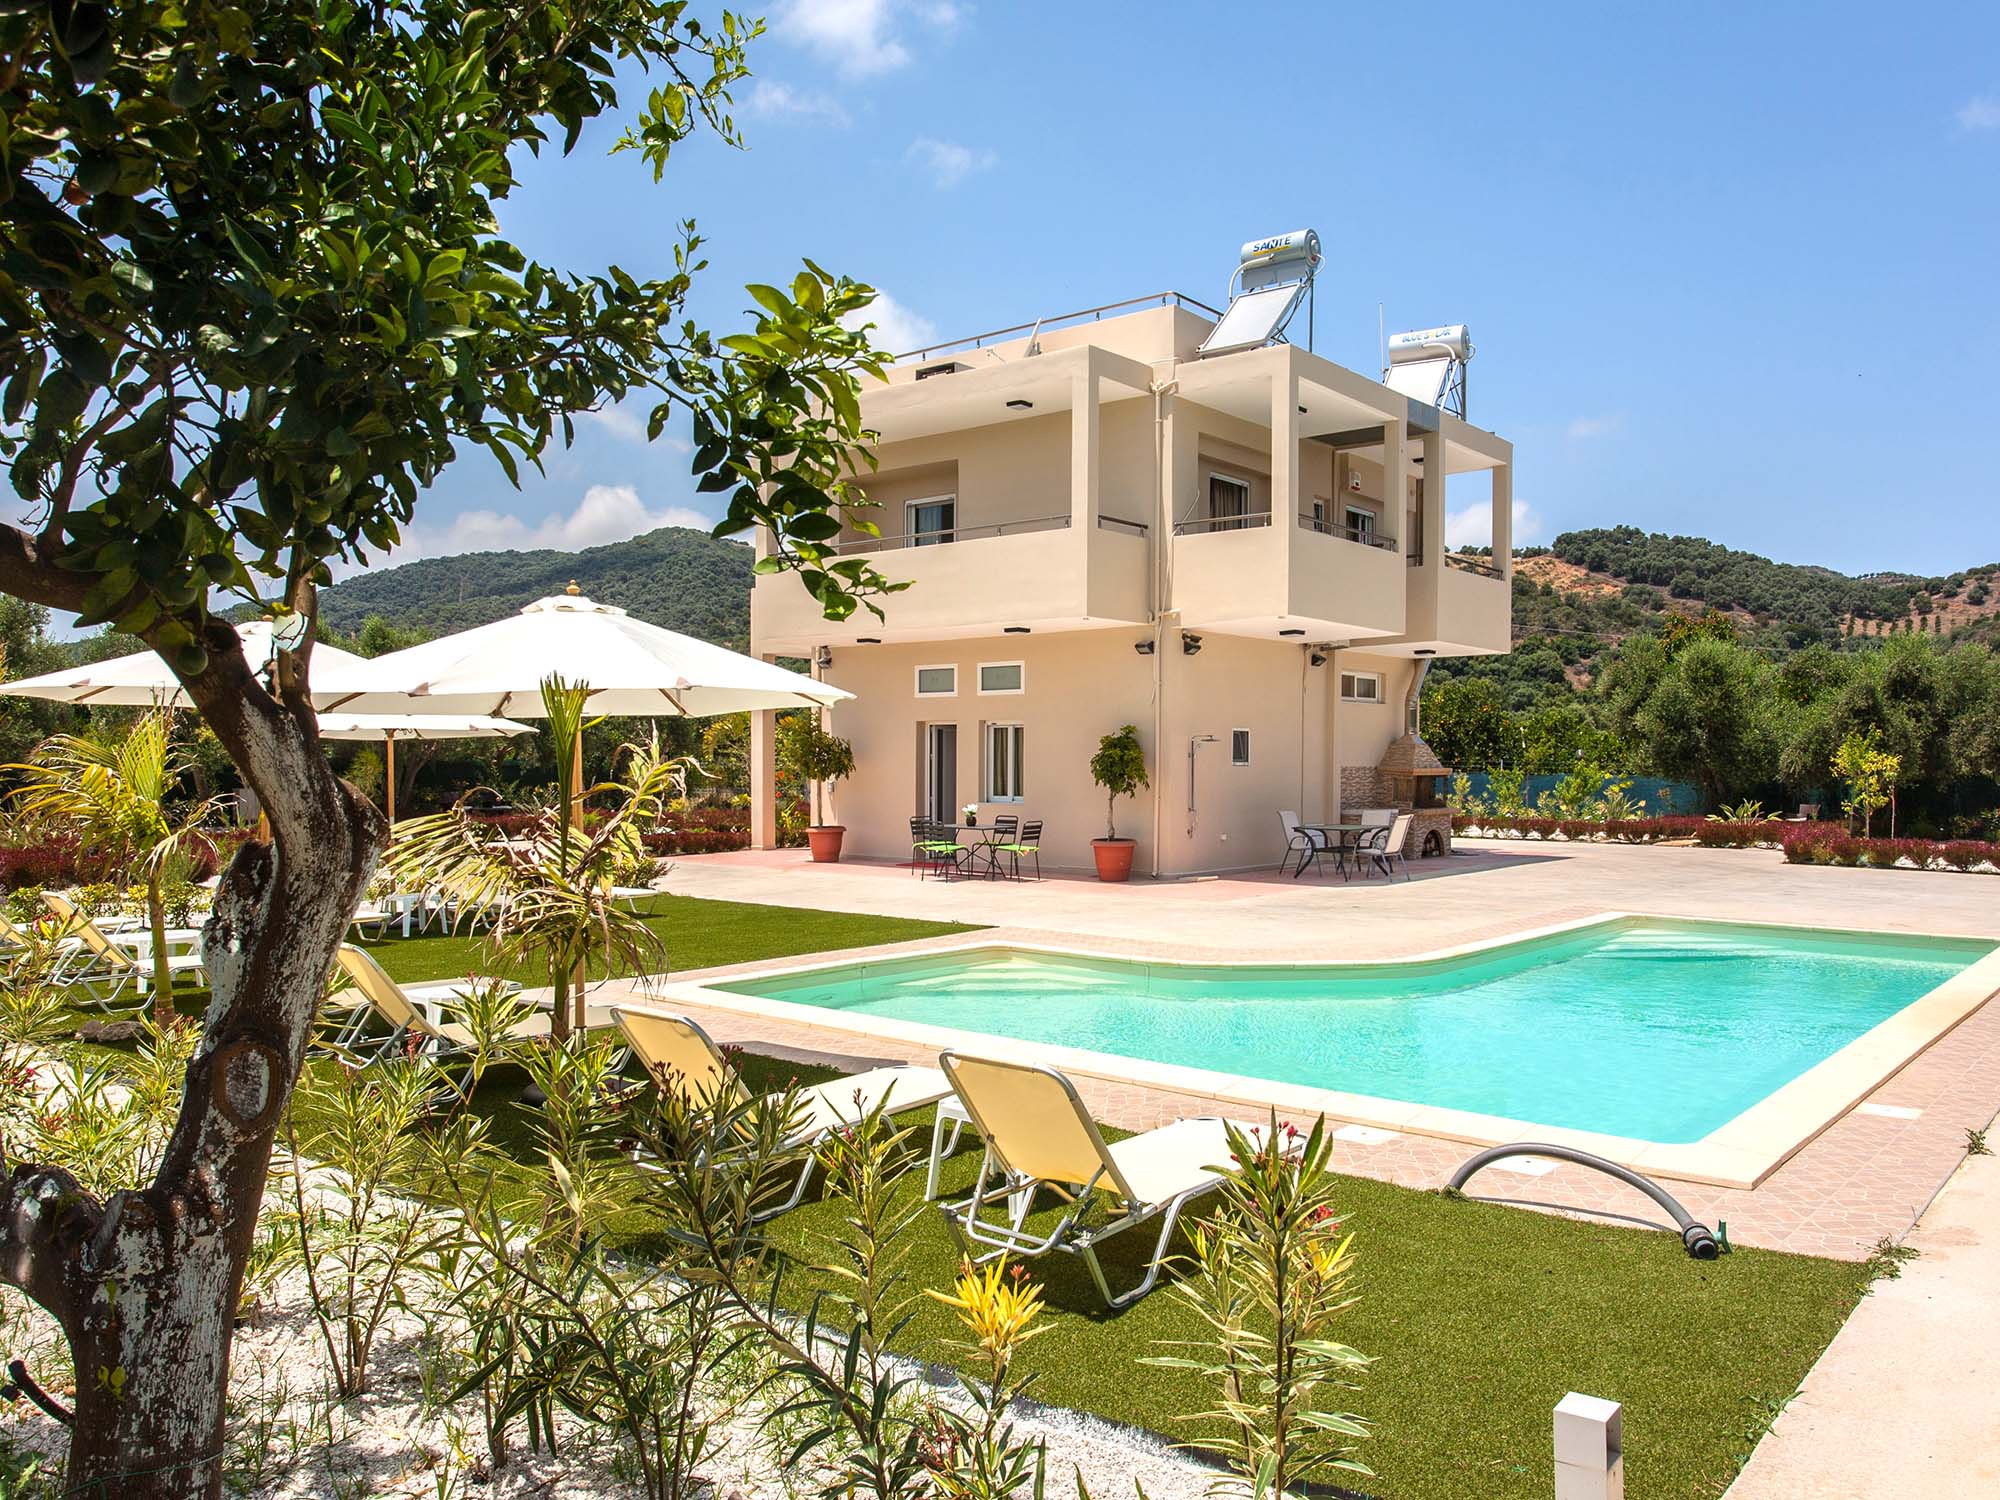 vacation-rentals-house-apartments-in-platanias-agia-marina-green-villa-exterior_02.jpg